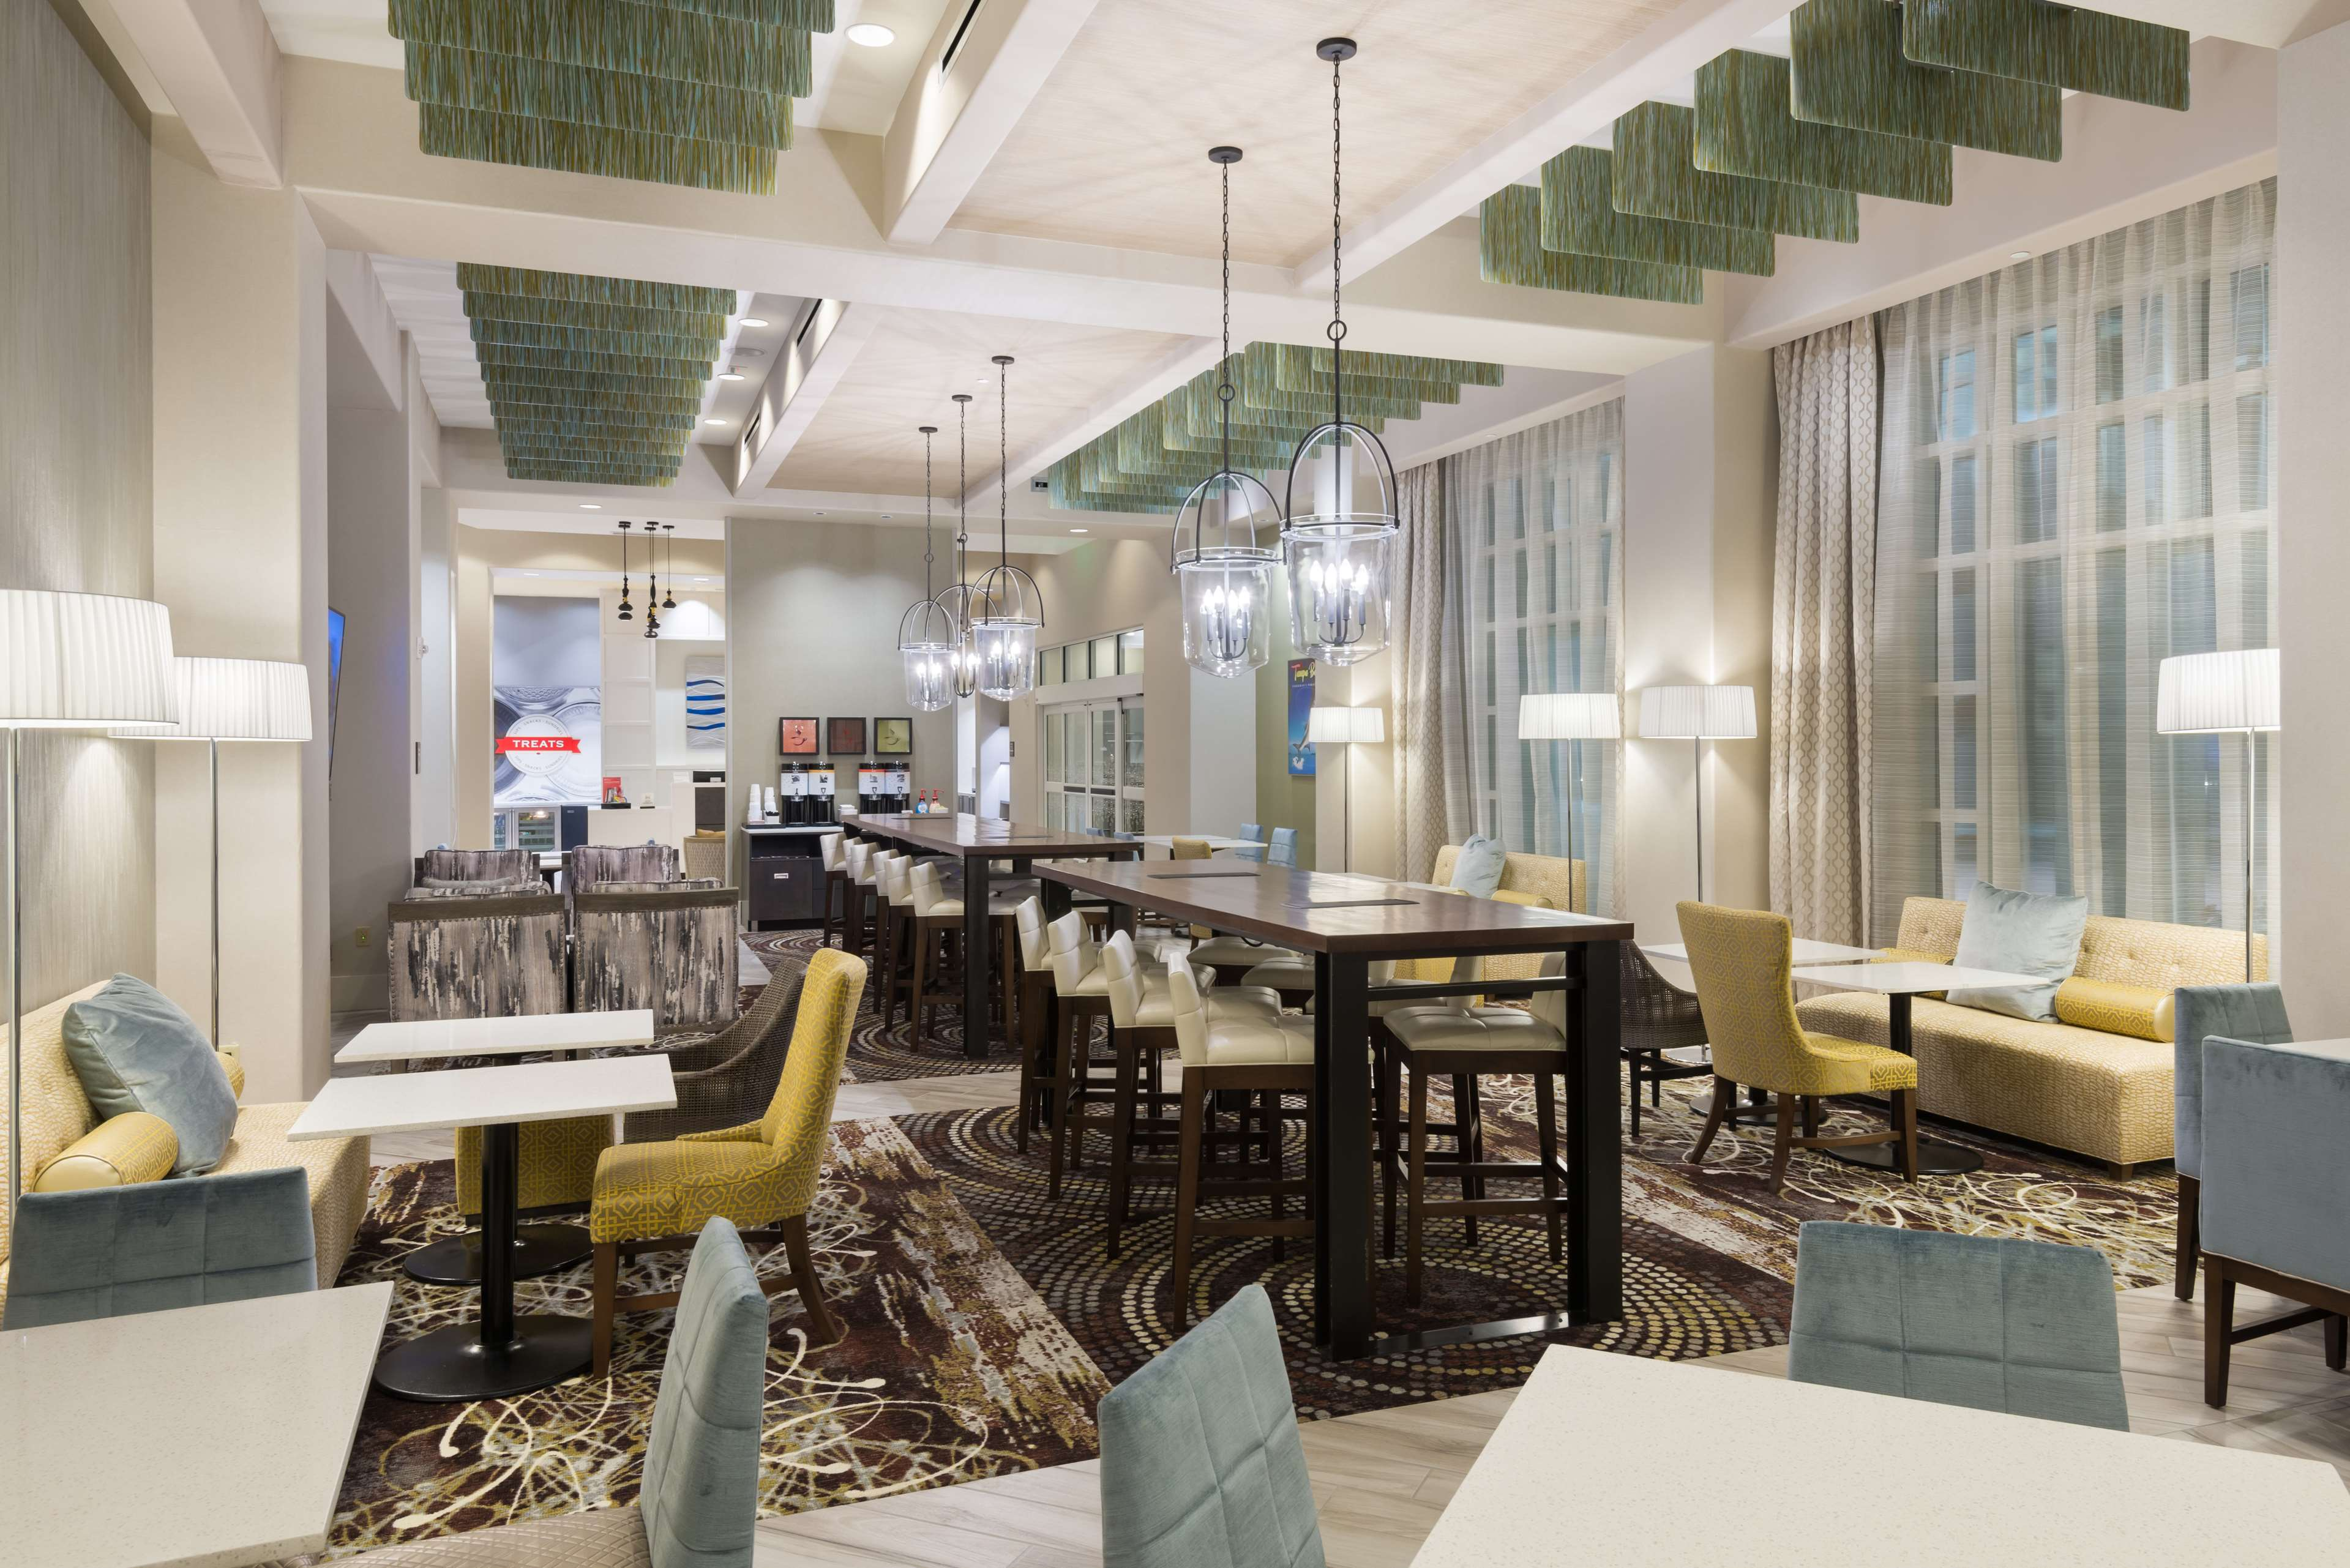 Hampton Inn & Suites Tampa Airport Avion Park Westshore image 3